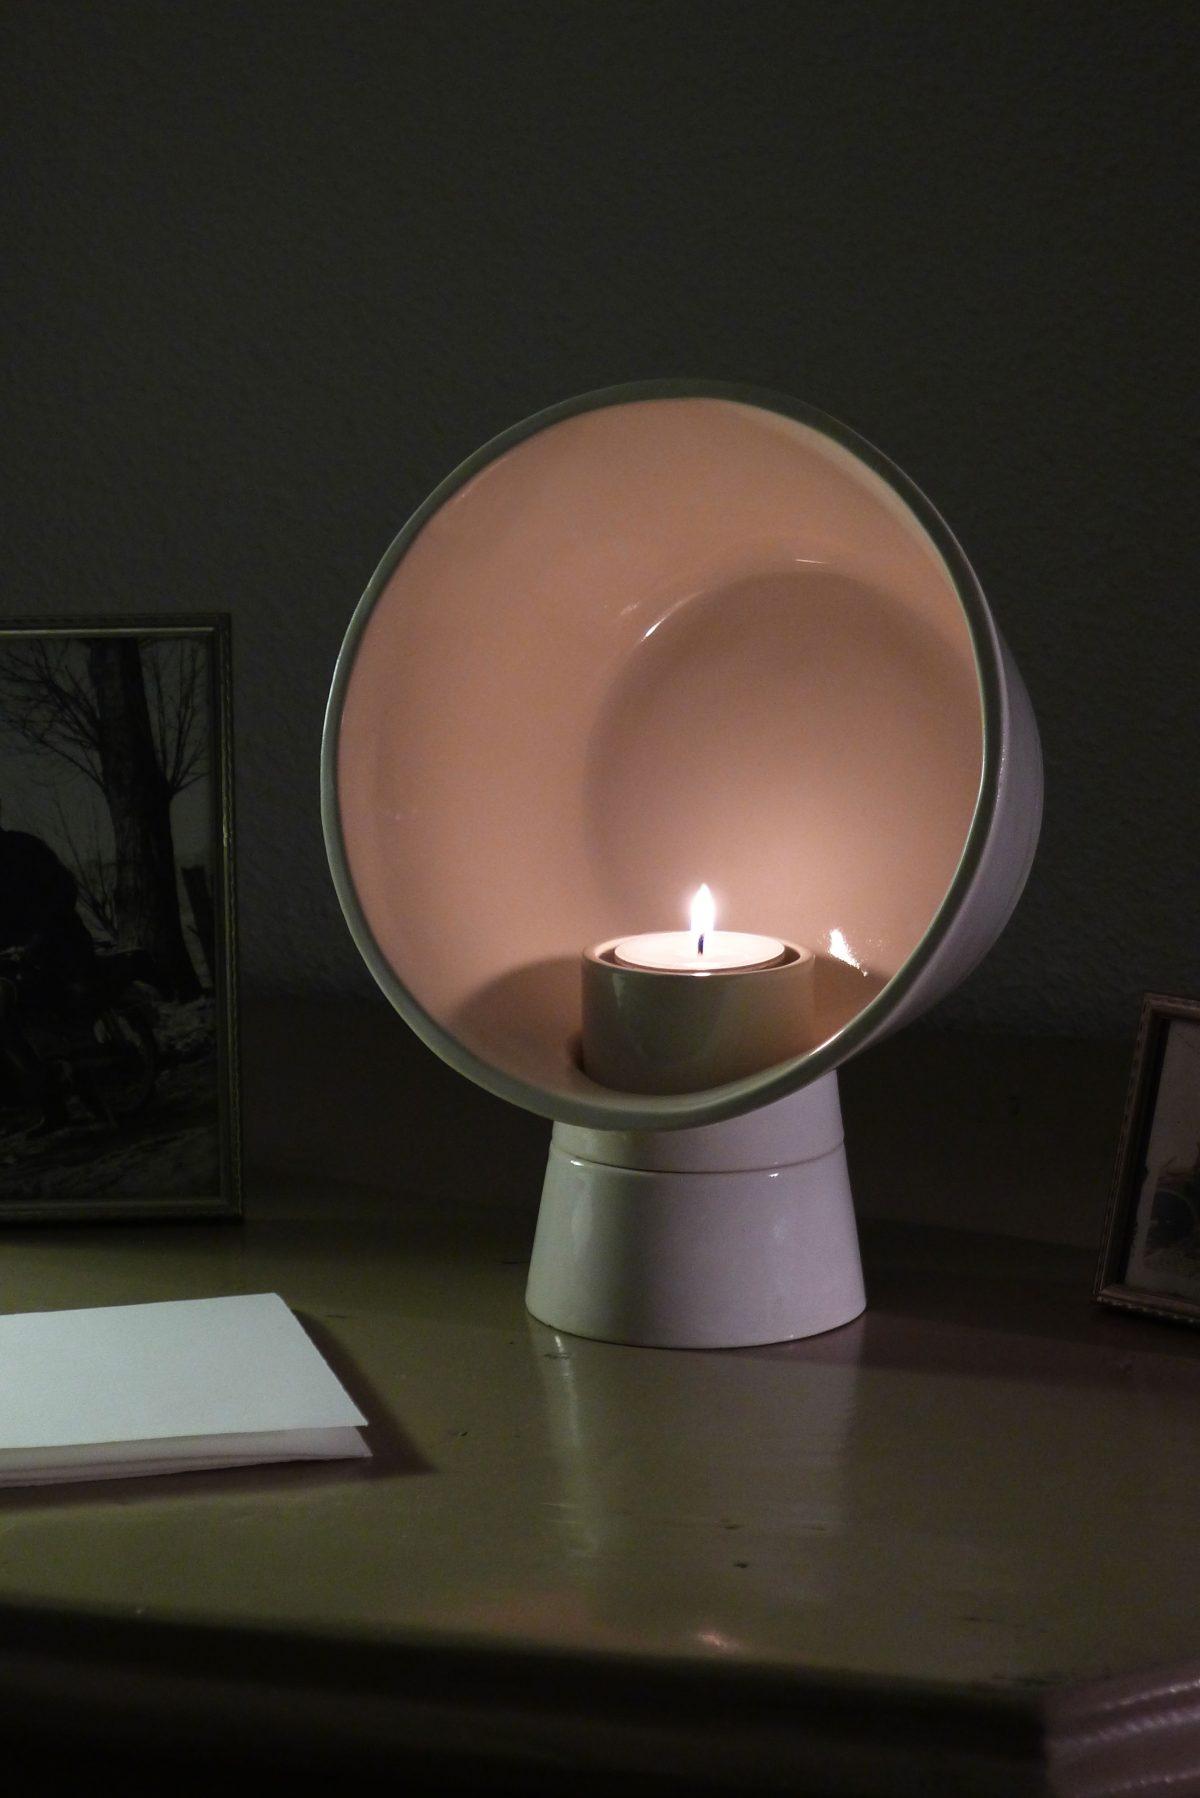 Kranen / Gille BASE T Bowl waxinelichthouder candlebowl